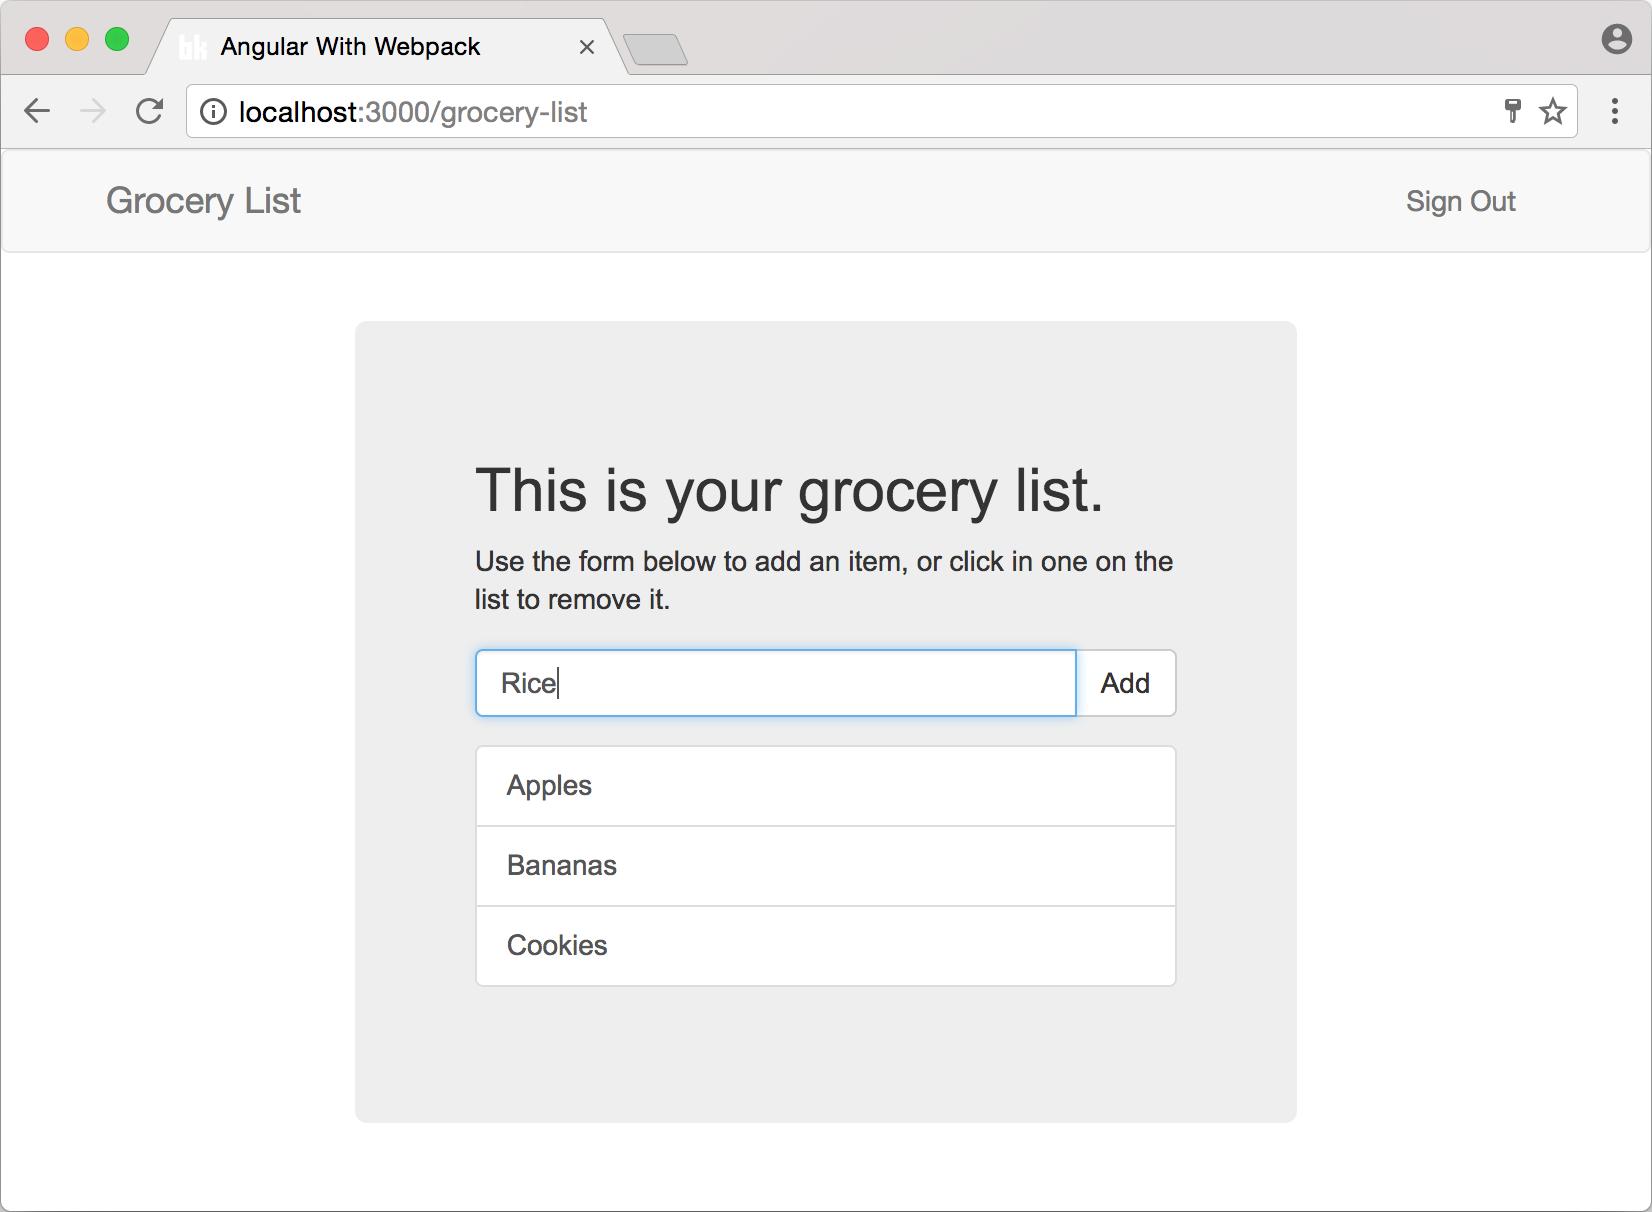 Grocery List app built with Angular 2 and Koa